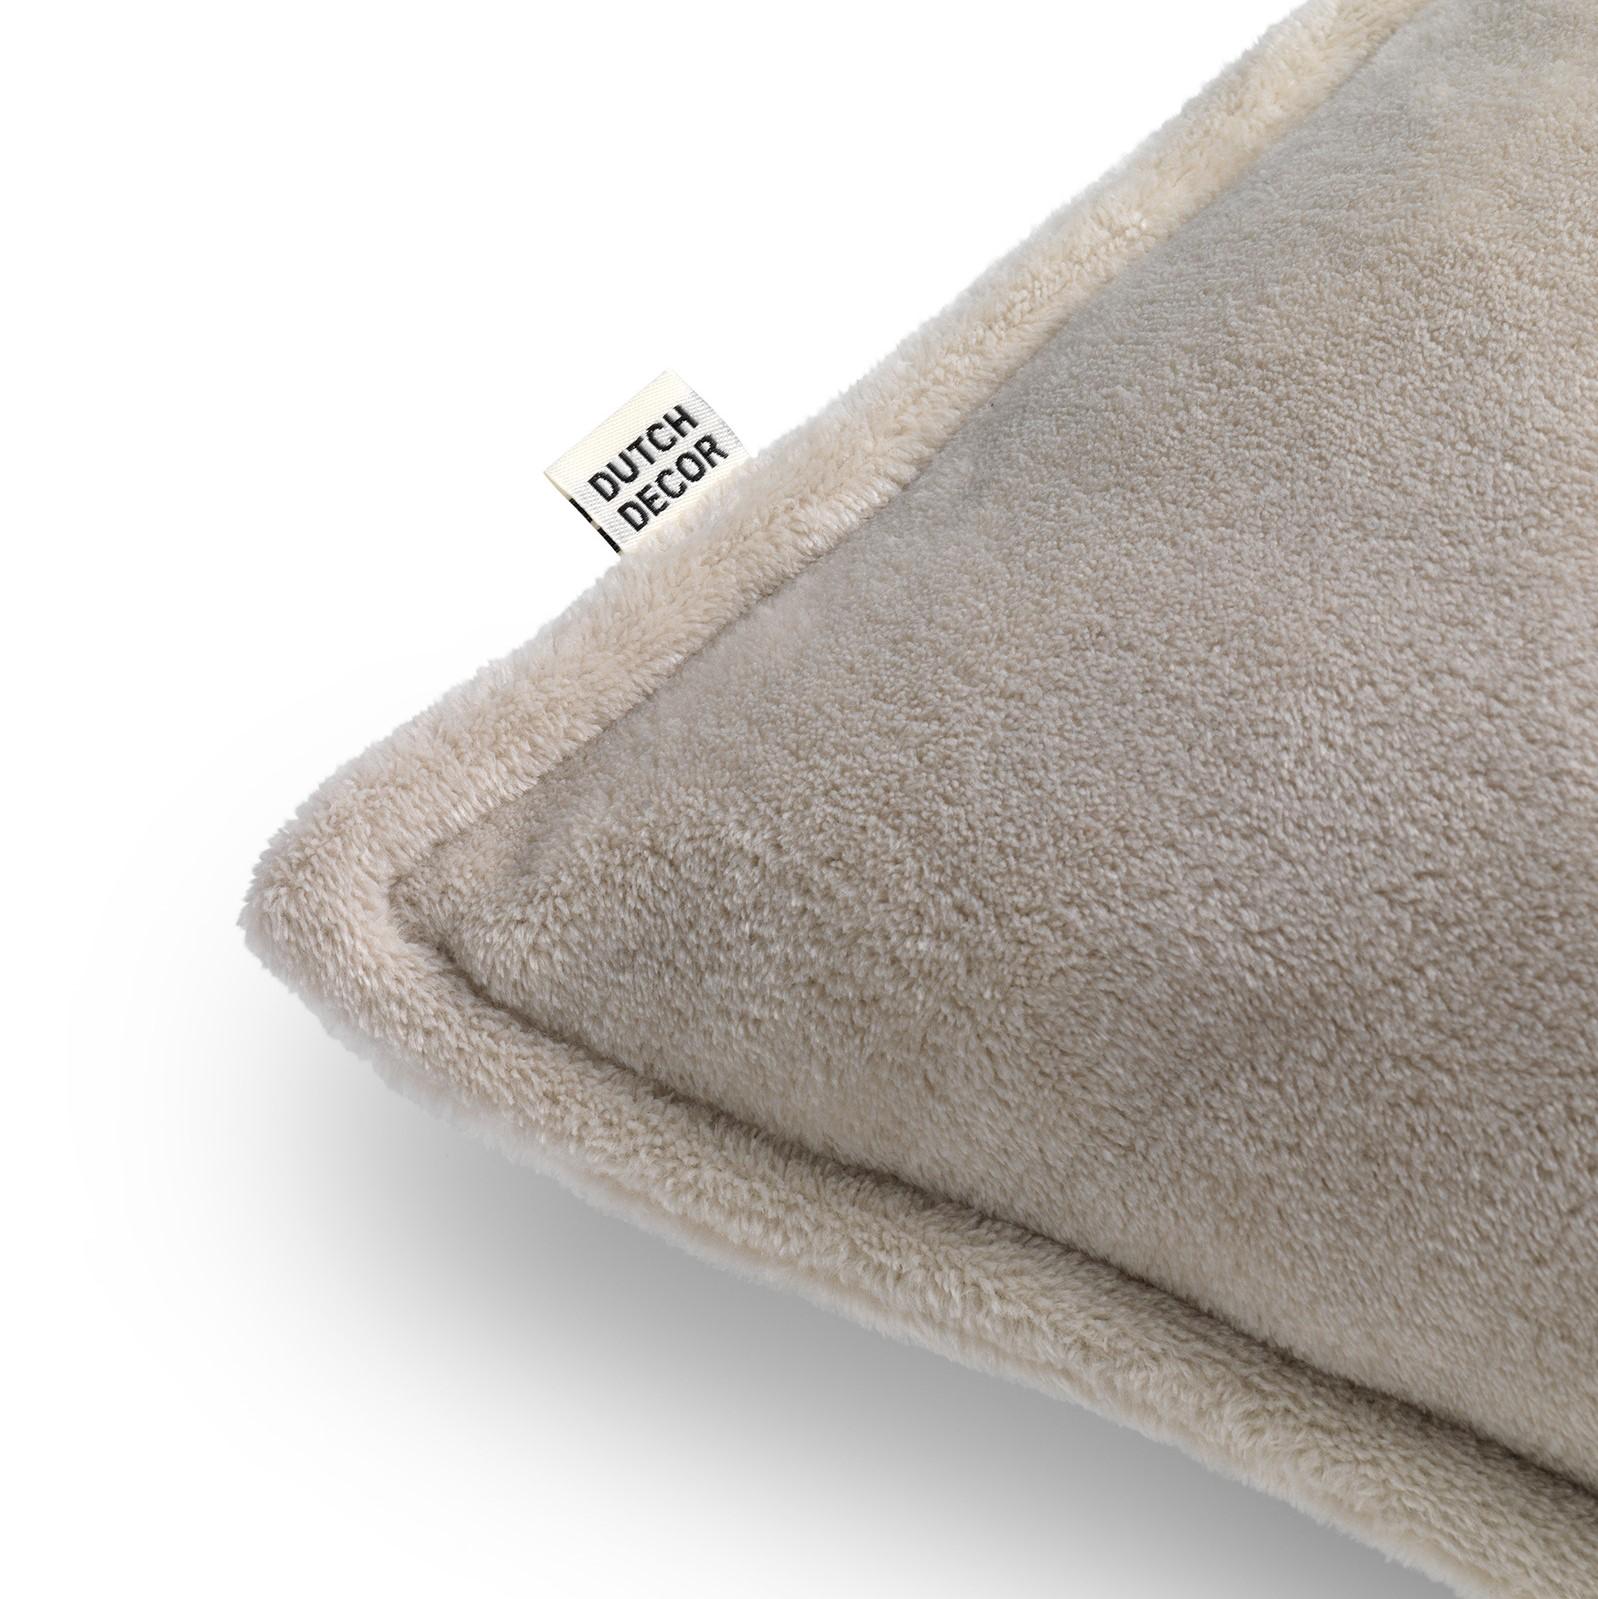 CILLY - Sierkussen van fleece Pumice Stone 45x45 cm